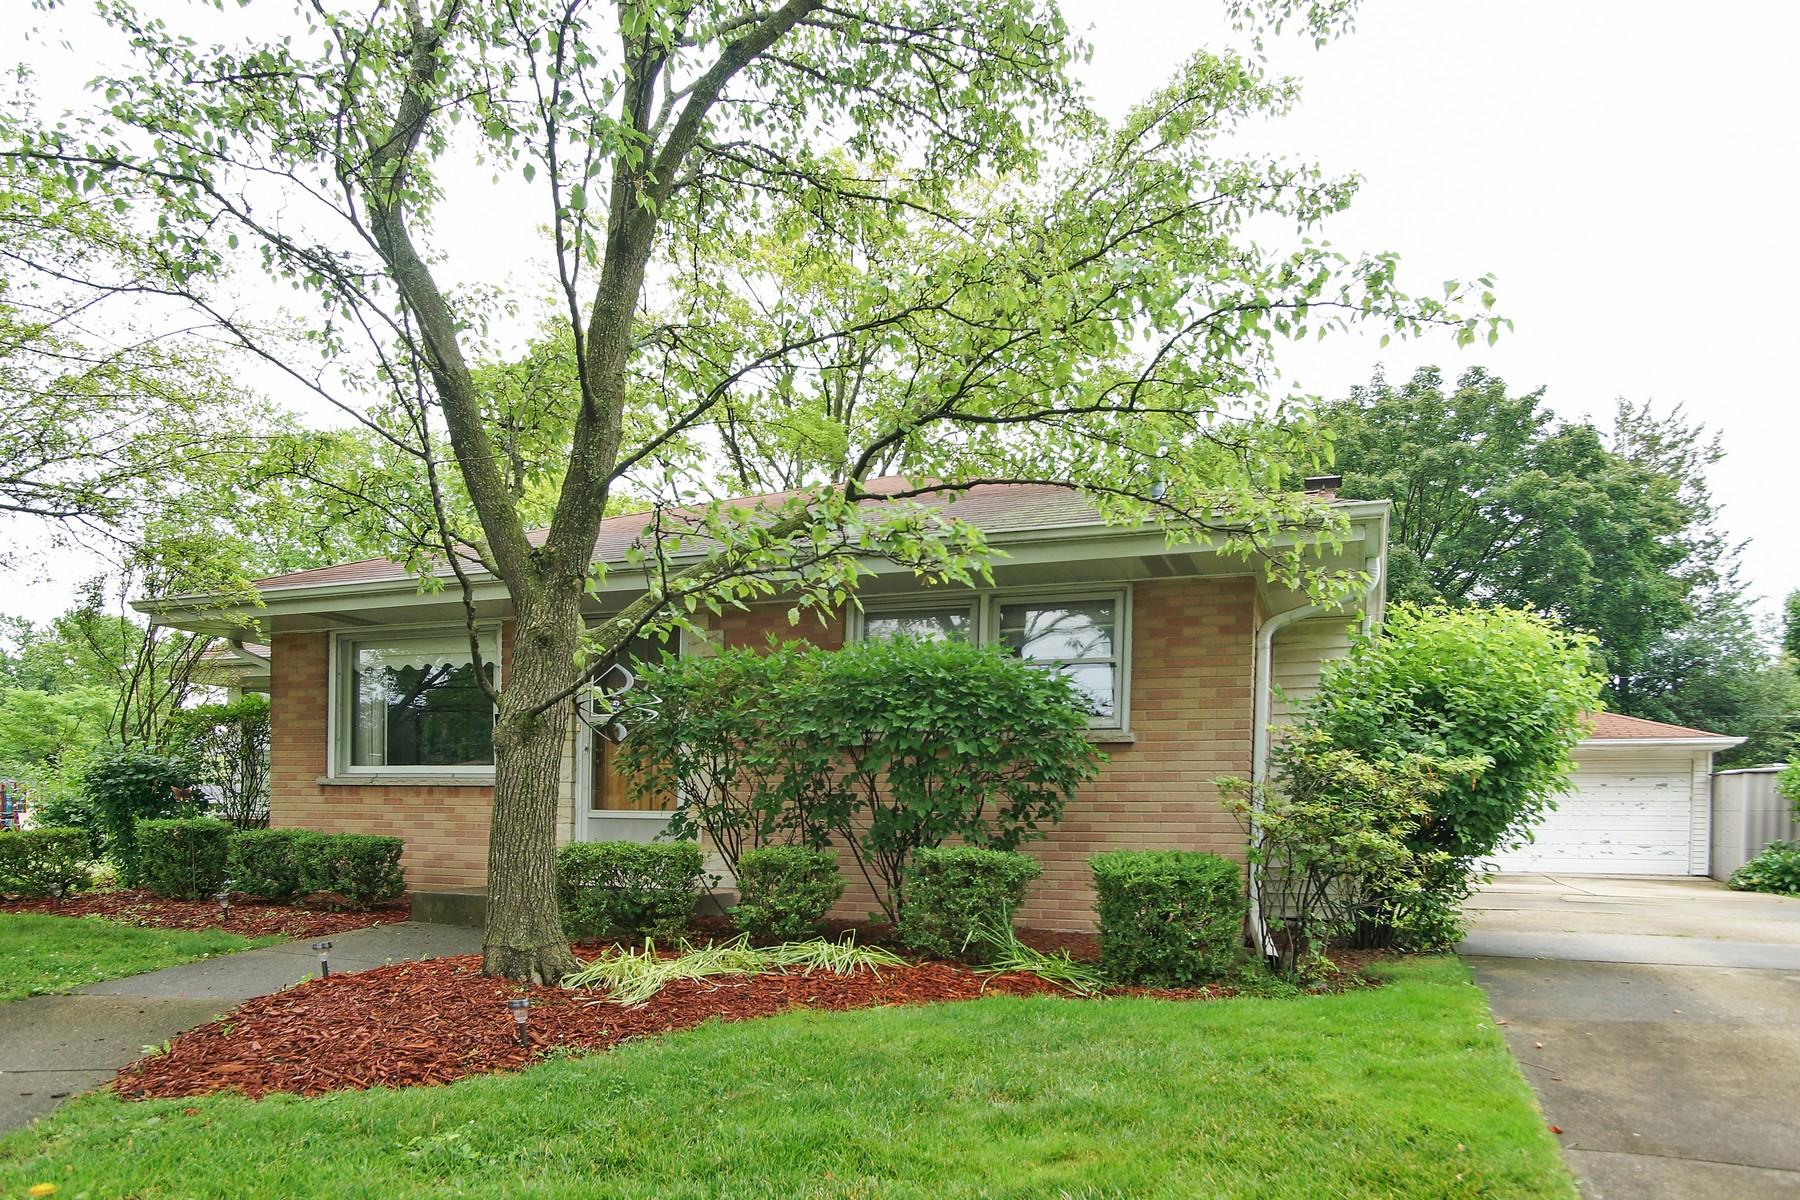 Casa para uma família para Venda às Lovely Split Level 102 N Waterman Avenue Arlington Heights, Illinois, 60004 Estados Unidos